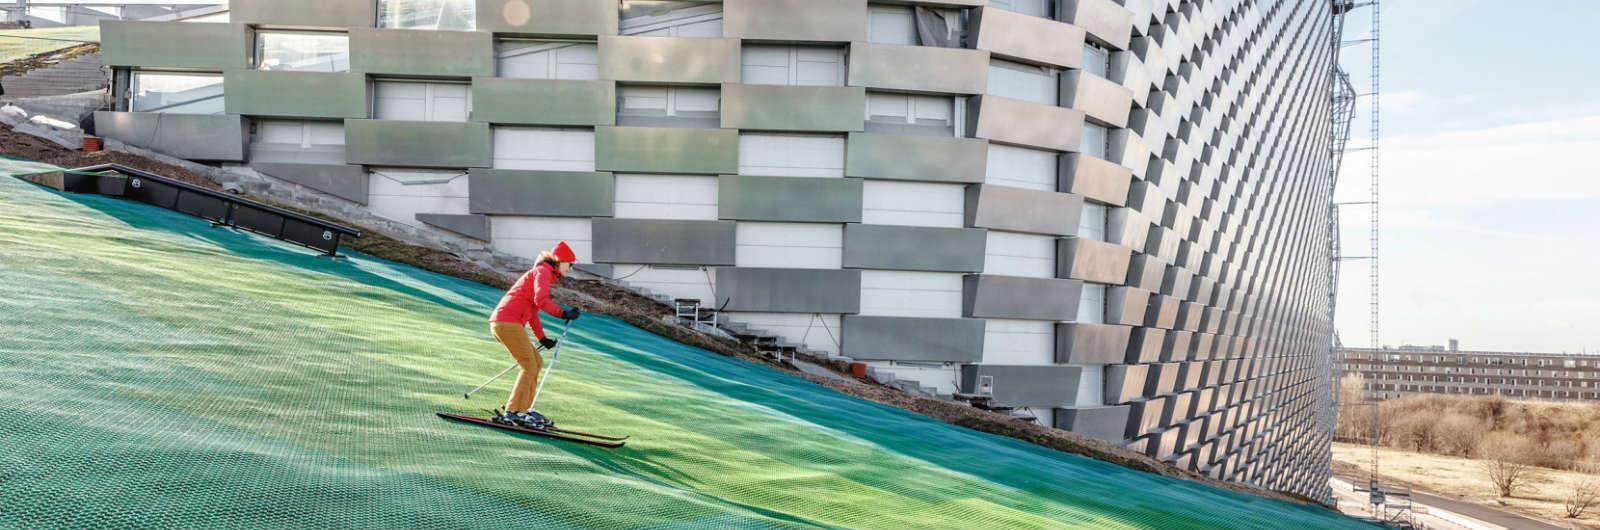 You Can Ski on a Copenhagen Power Plant